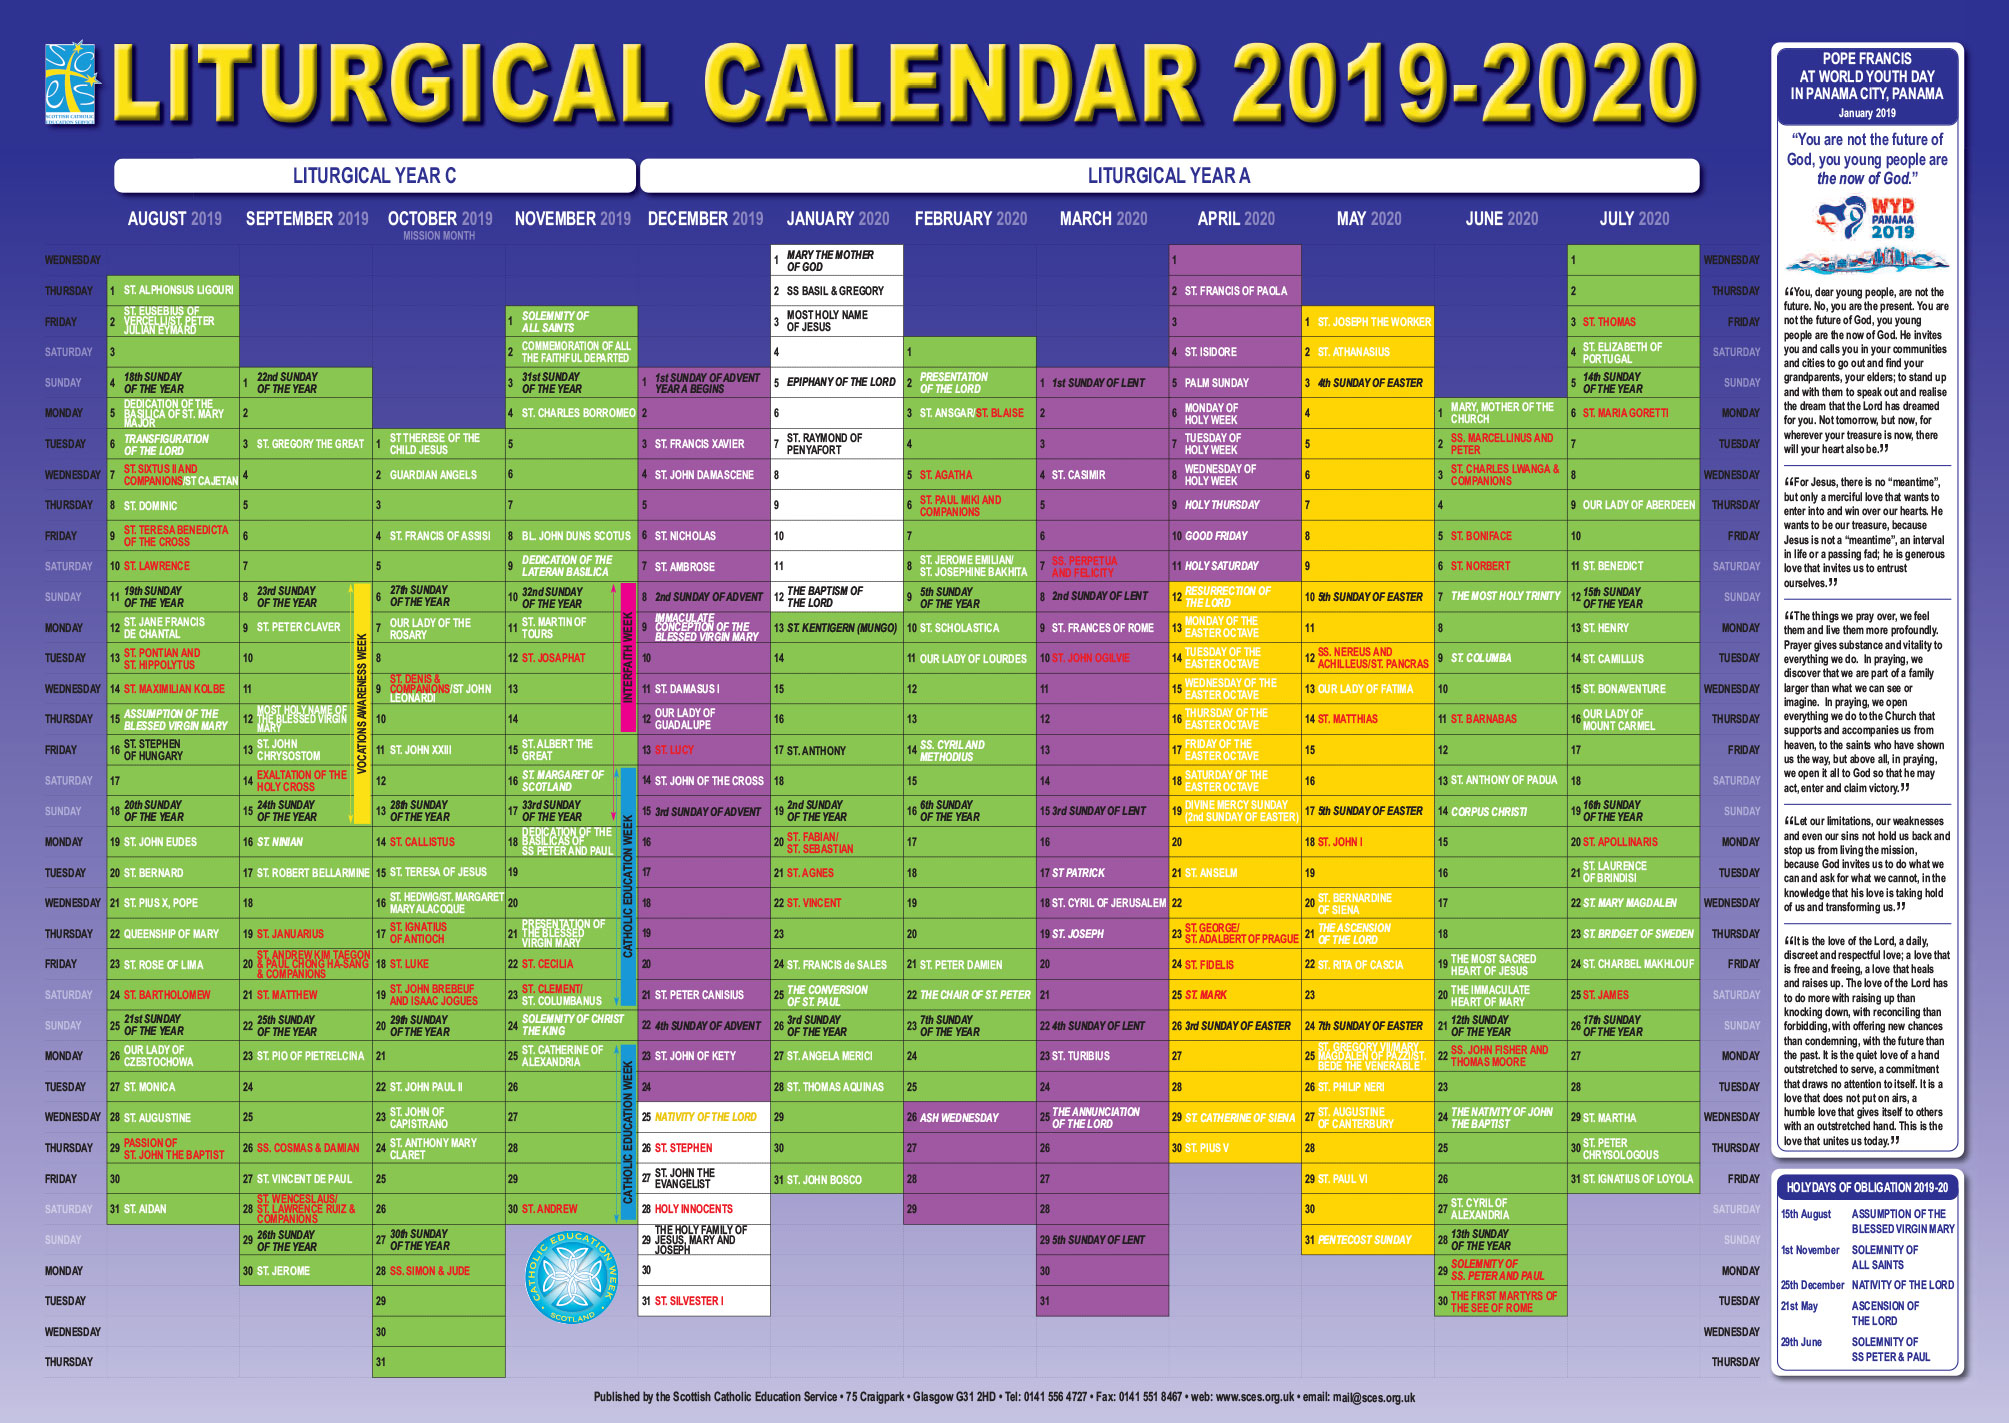 Scottish Catholic Education Service | Sces | Liturgical intended for 2020 Catholic Liturgical Calendar Pdf